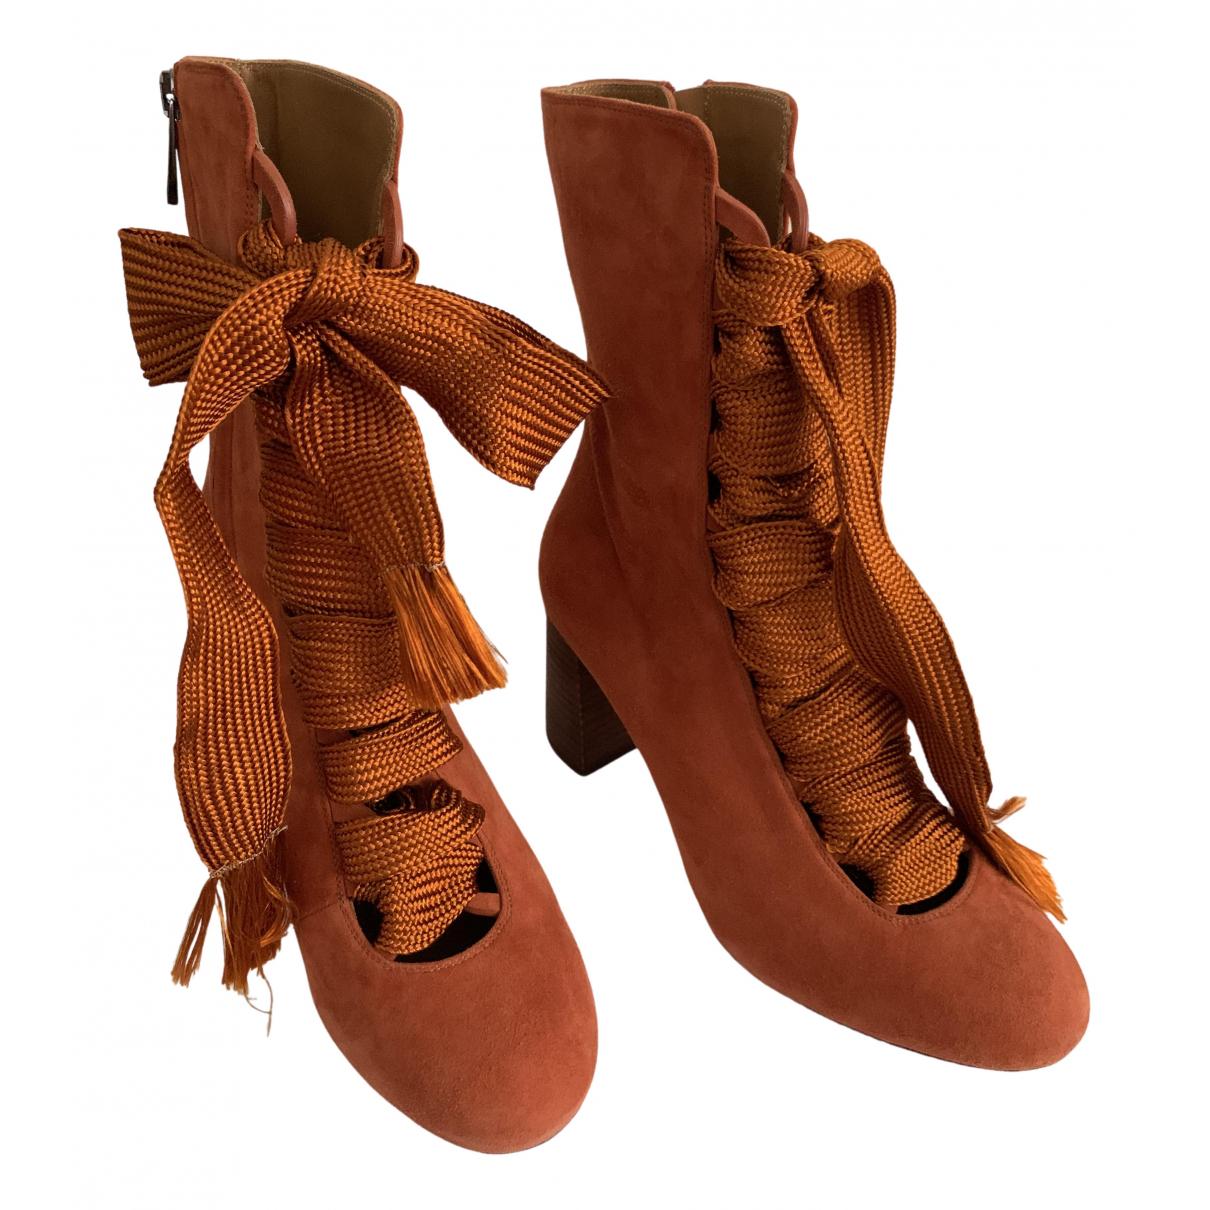 Chloé \N Camel Suede Boots for Women 37 EU